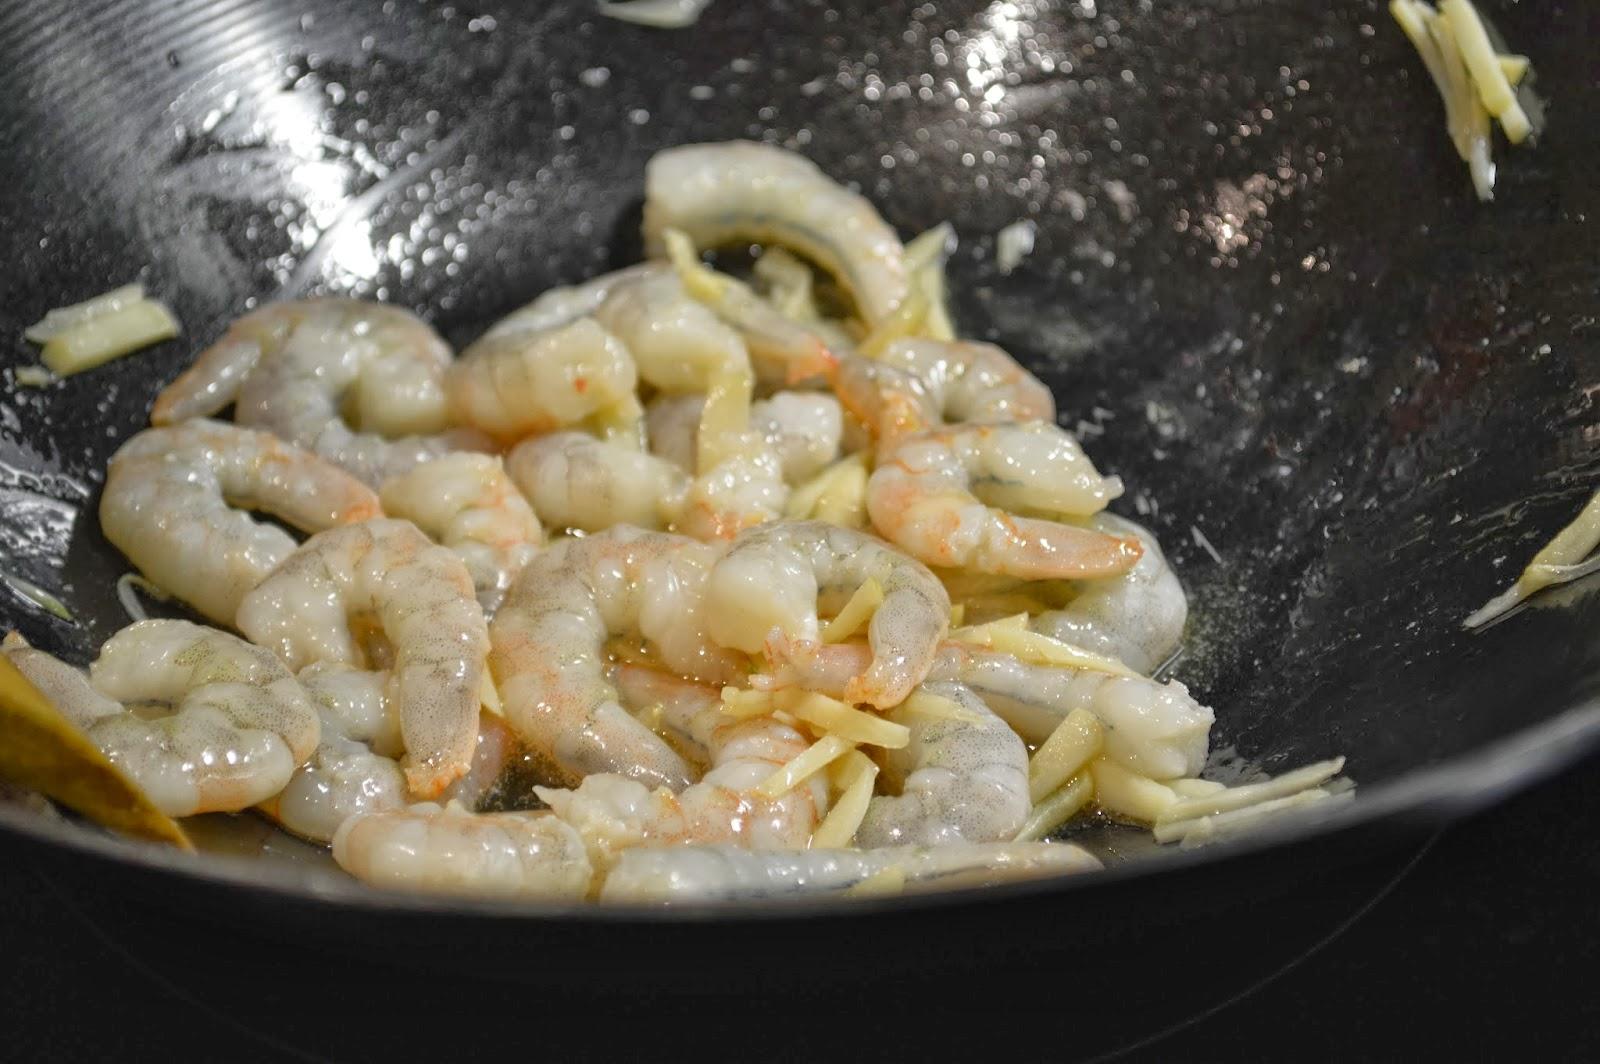 Cook prawns